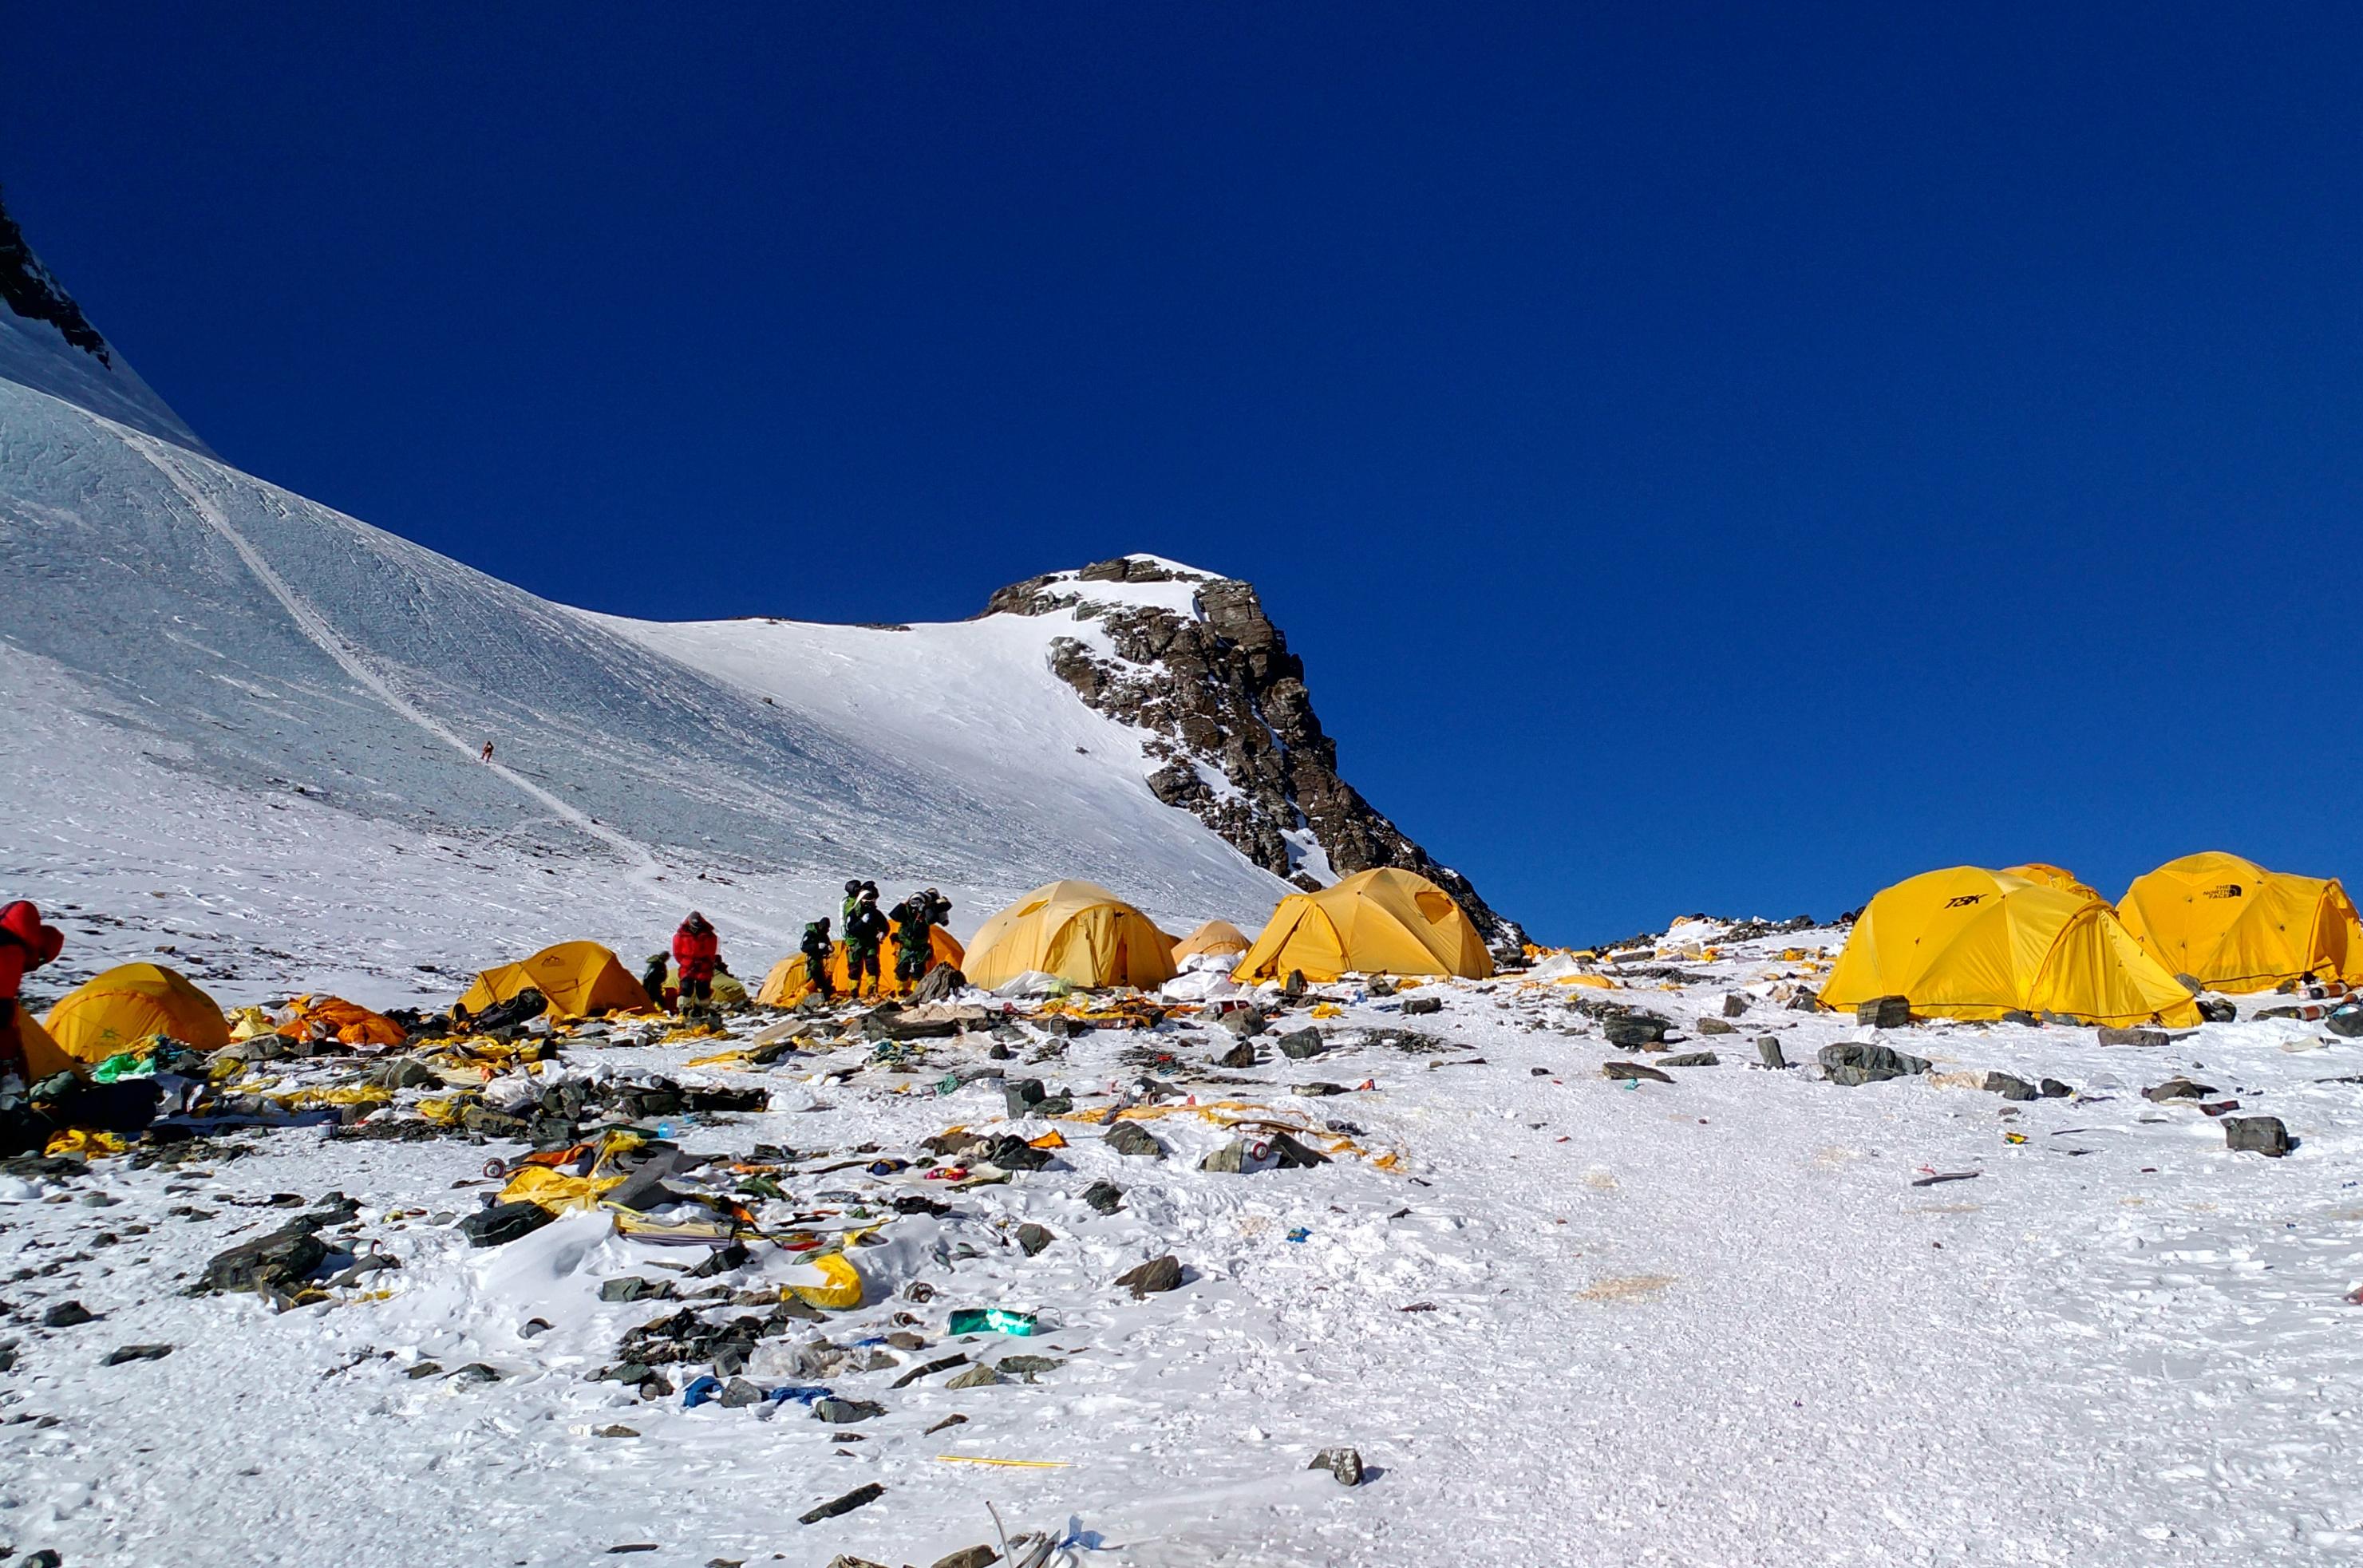 Vécé lesz a Mount Everesten 7000 méteren